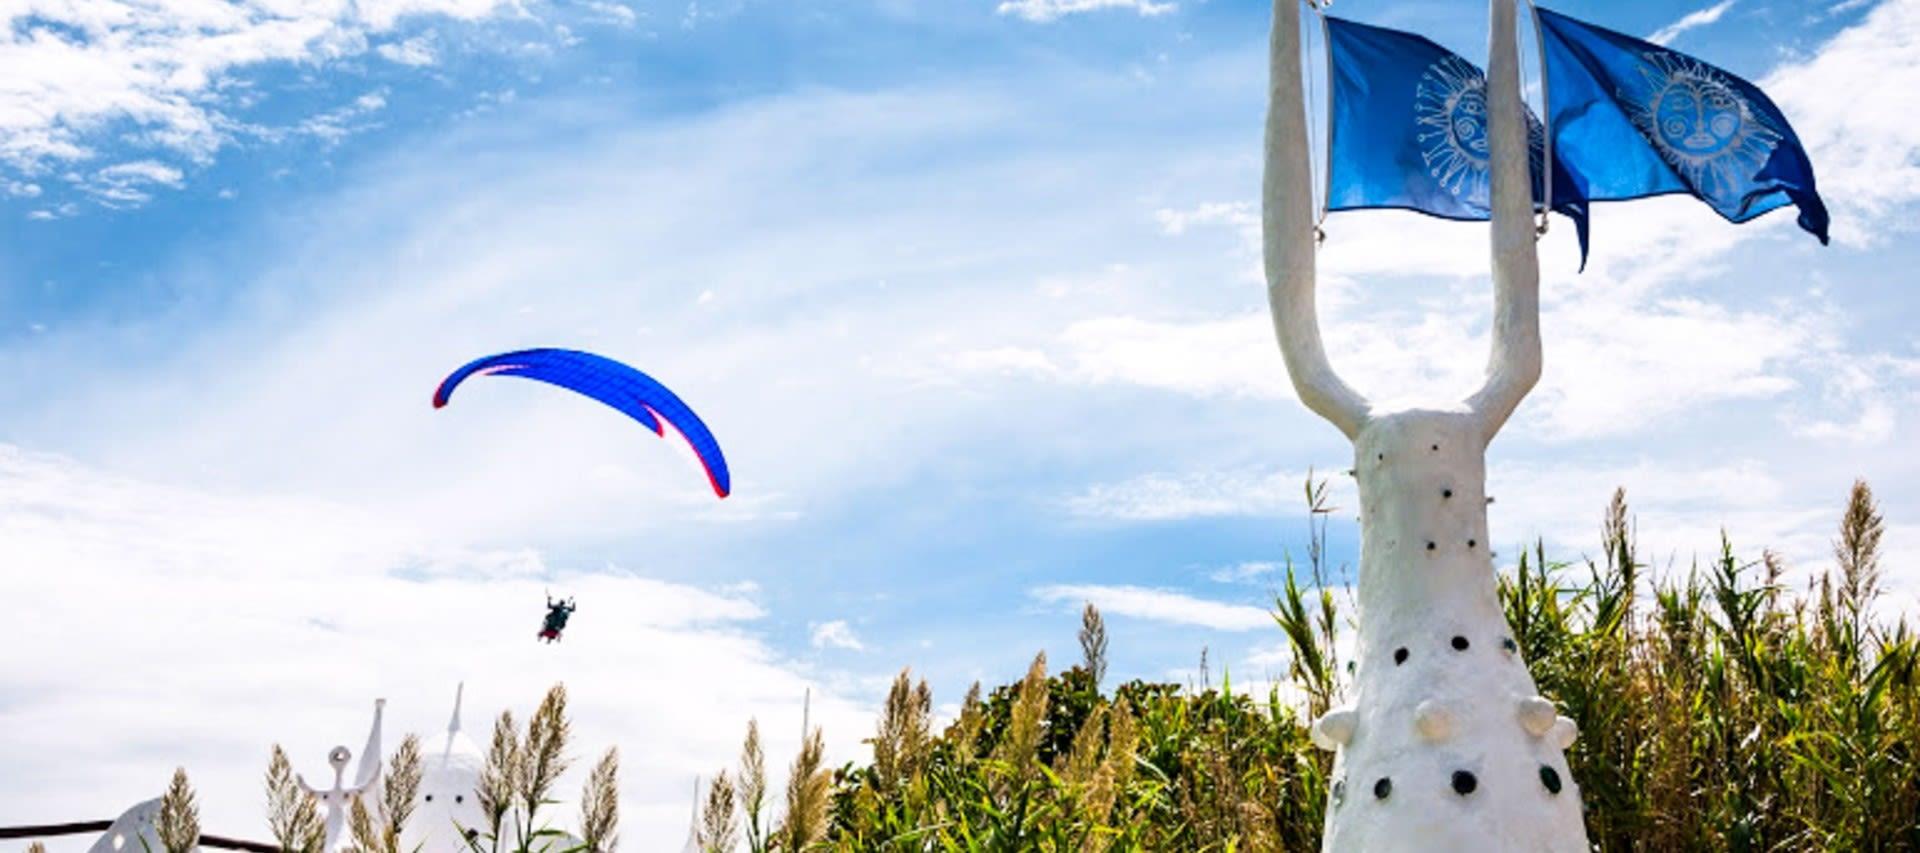 Paragliding in Uruguay